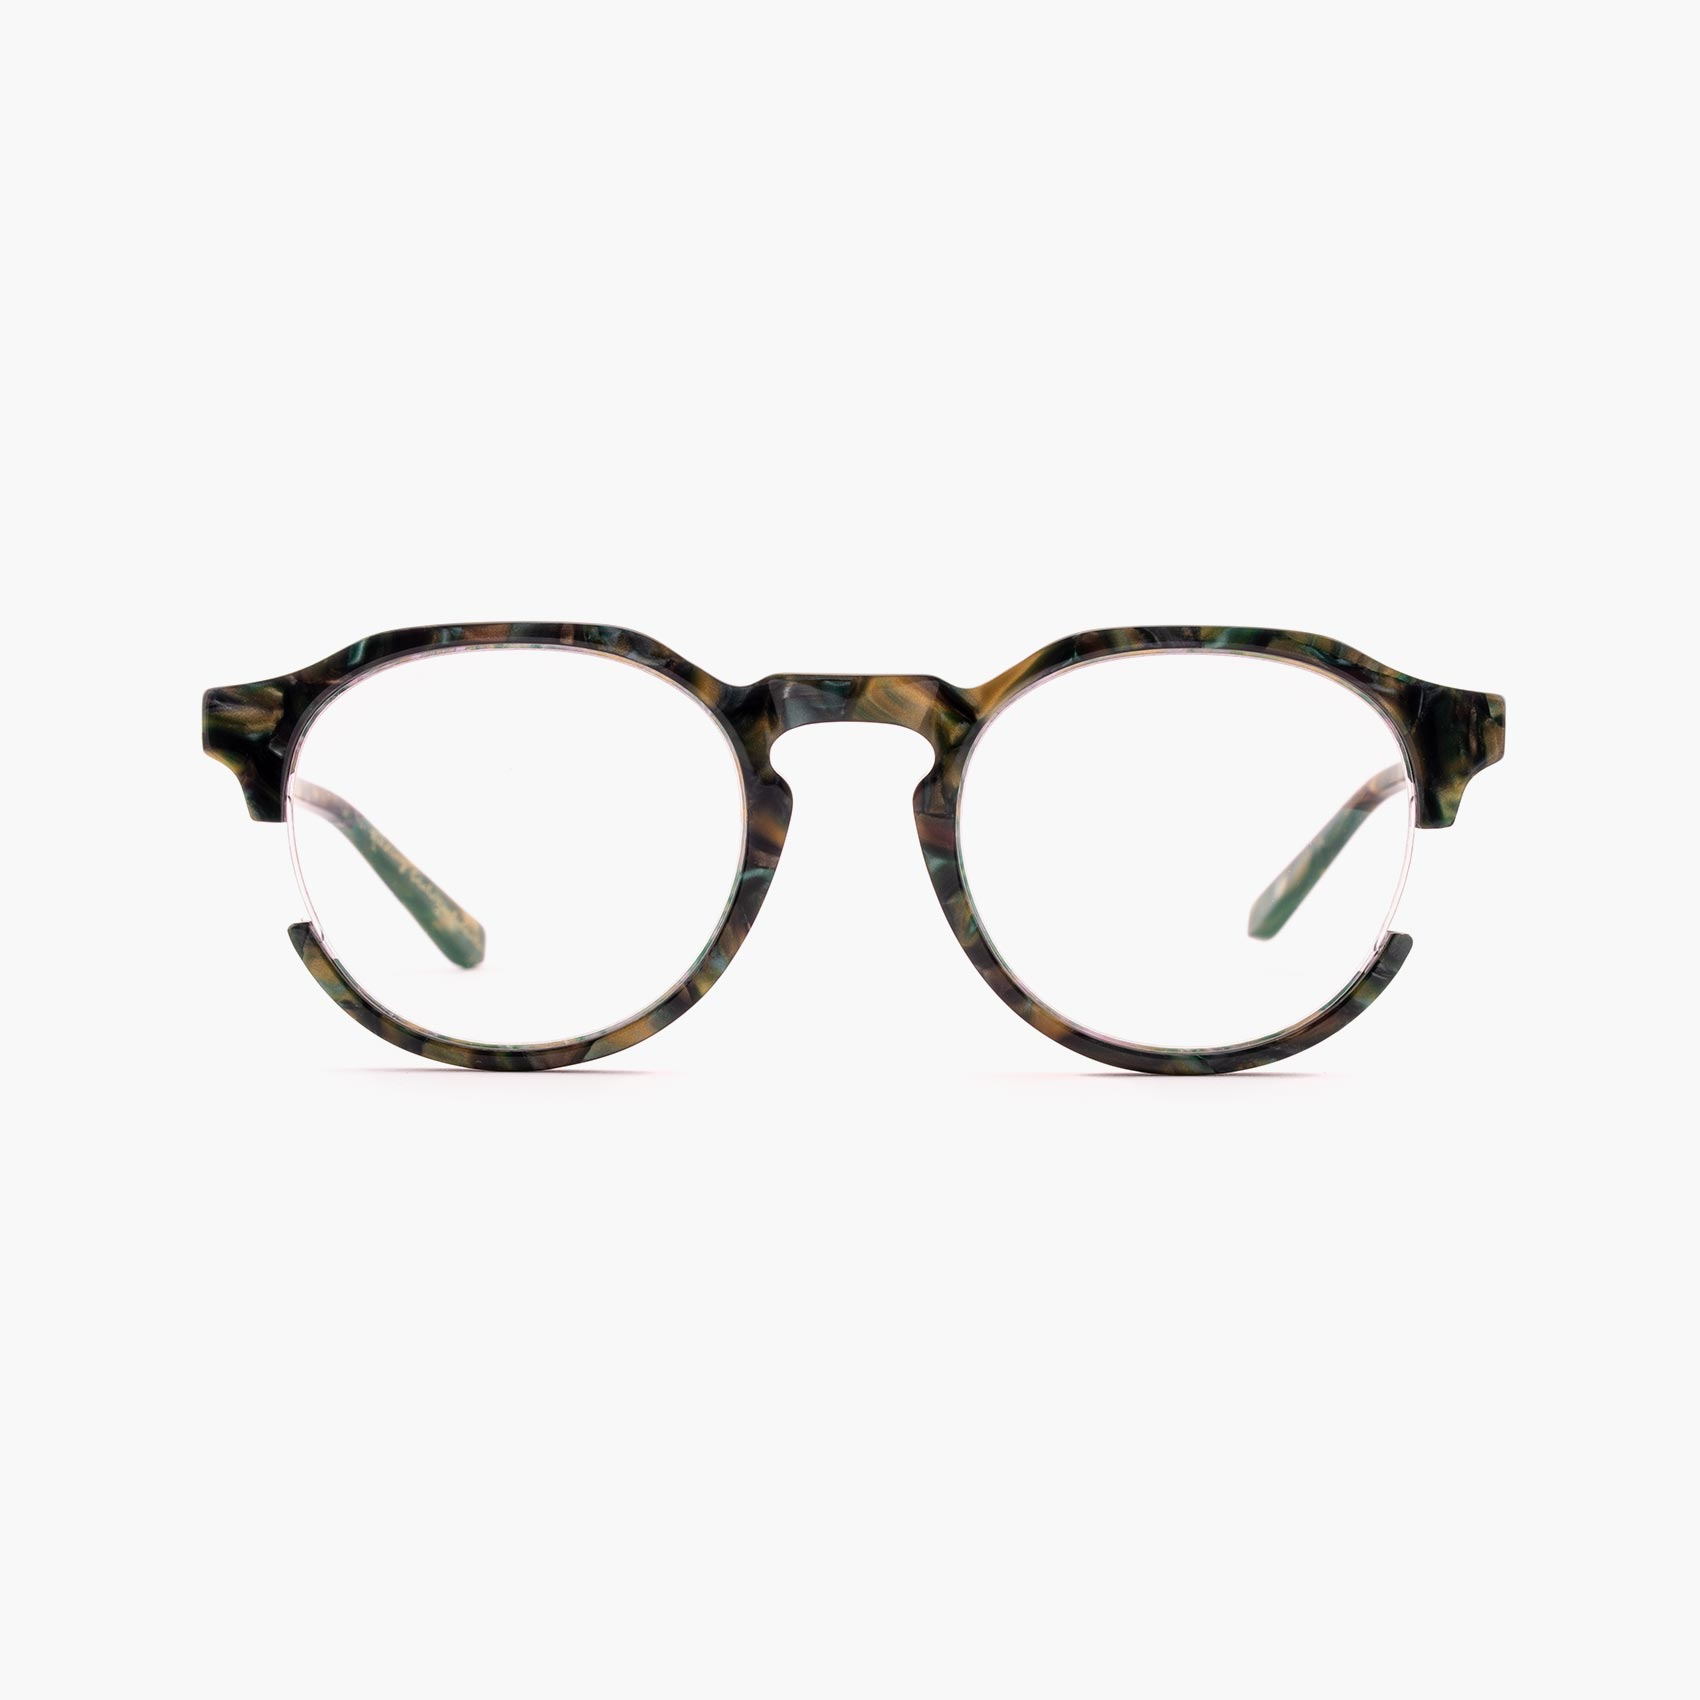 Proud eyewear Jodie C3 F gafas de acetato mujer graduadas